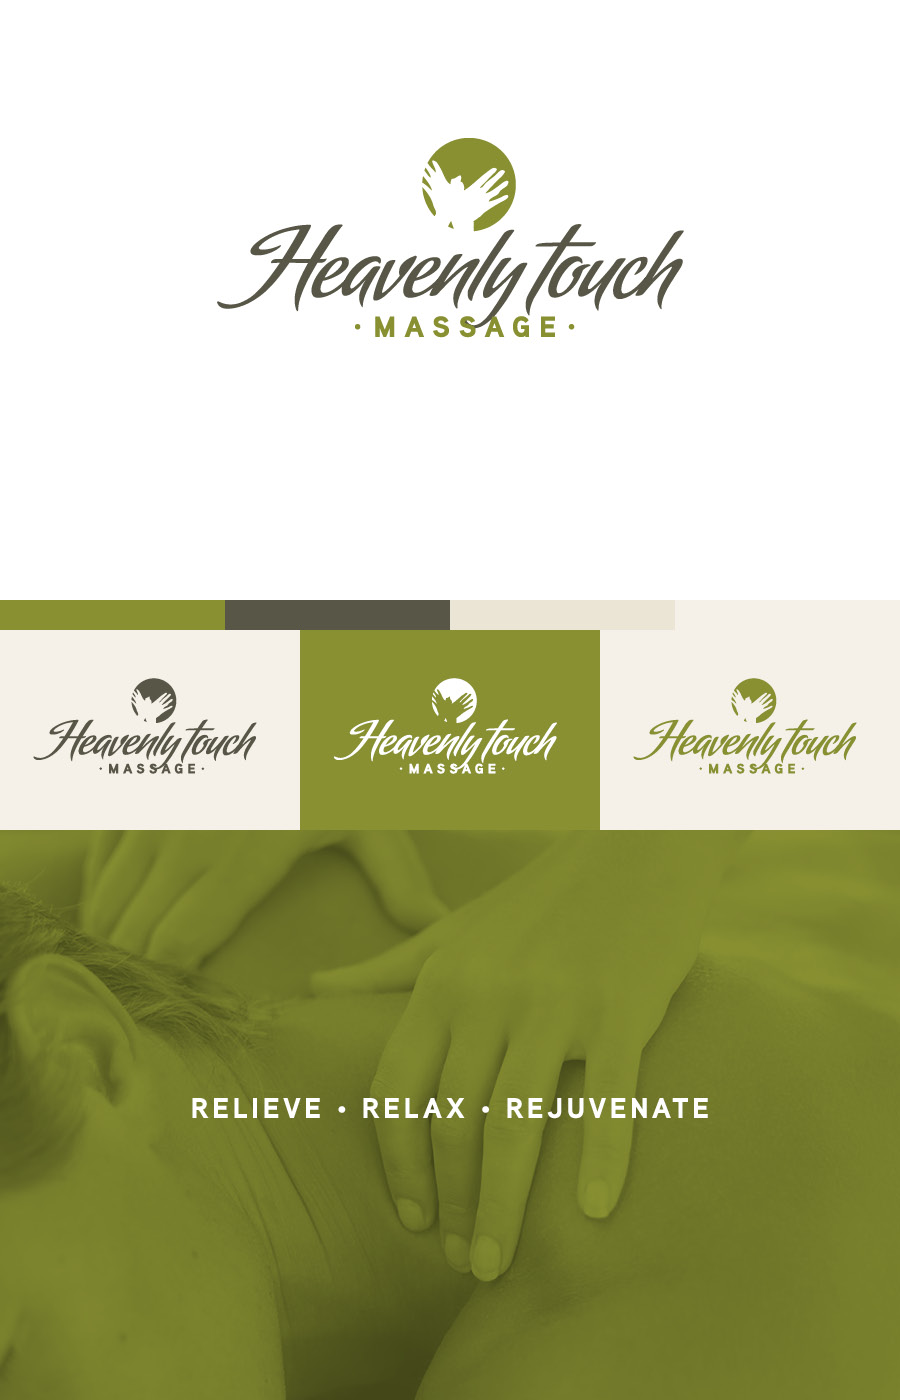 Heavenly Touch Massage Branding